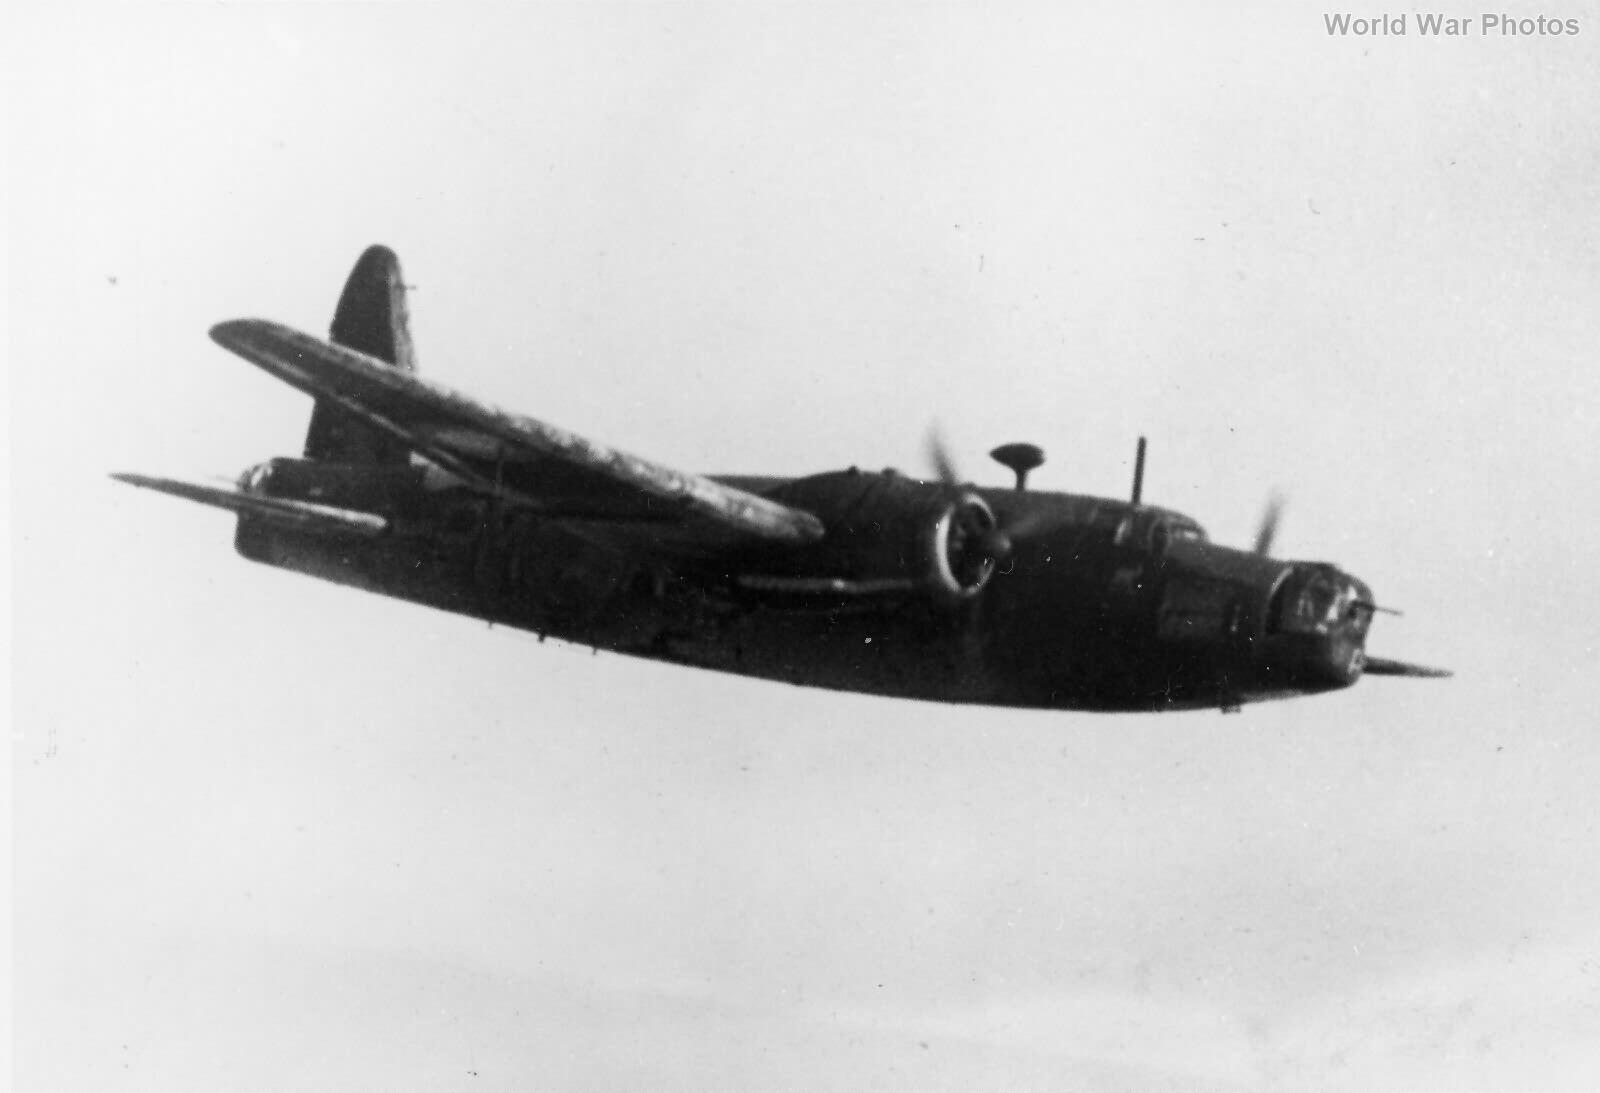 Vickers Wellington 103 Sqn PM-A